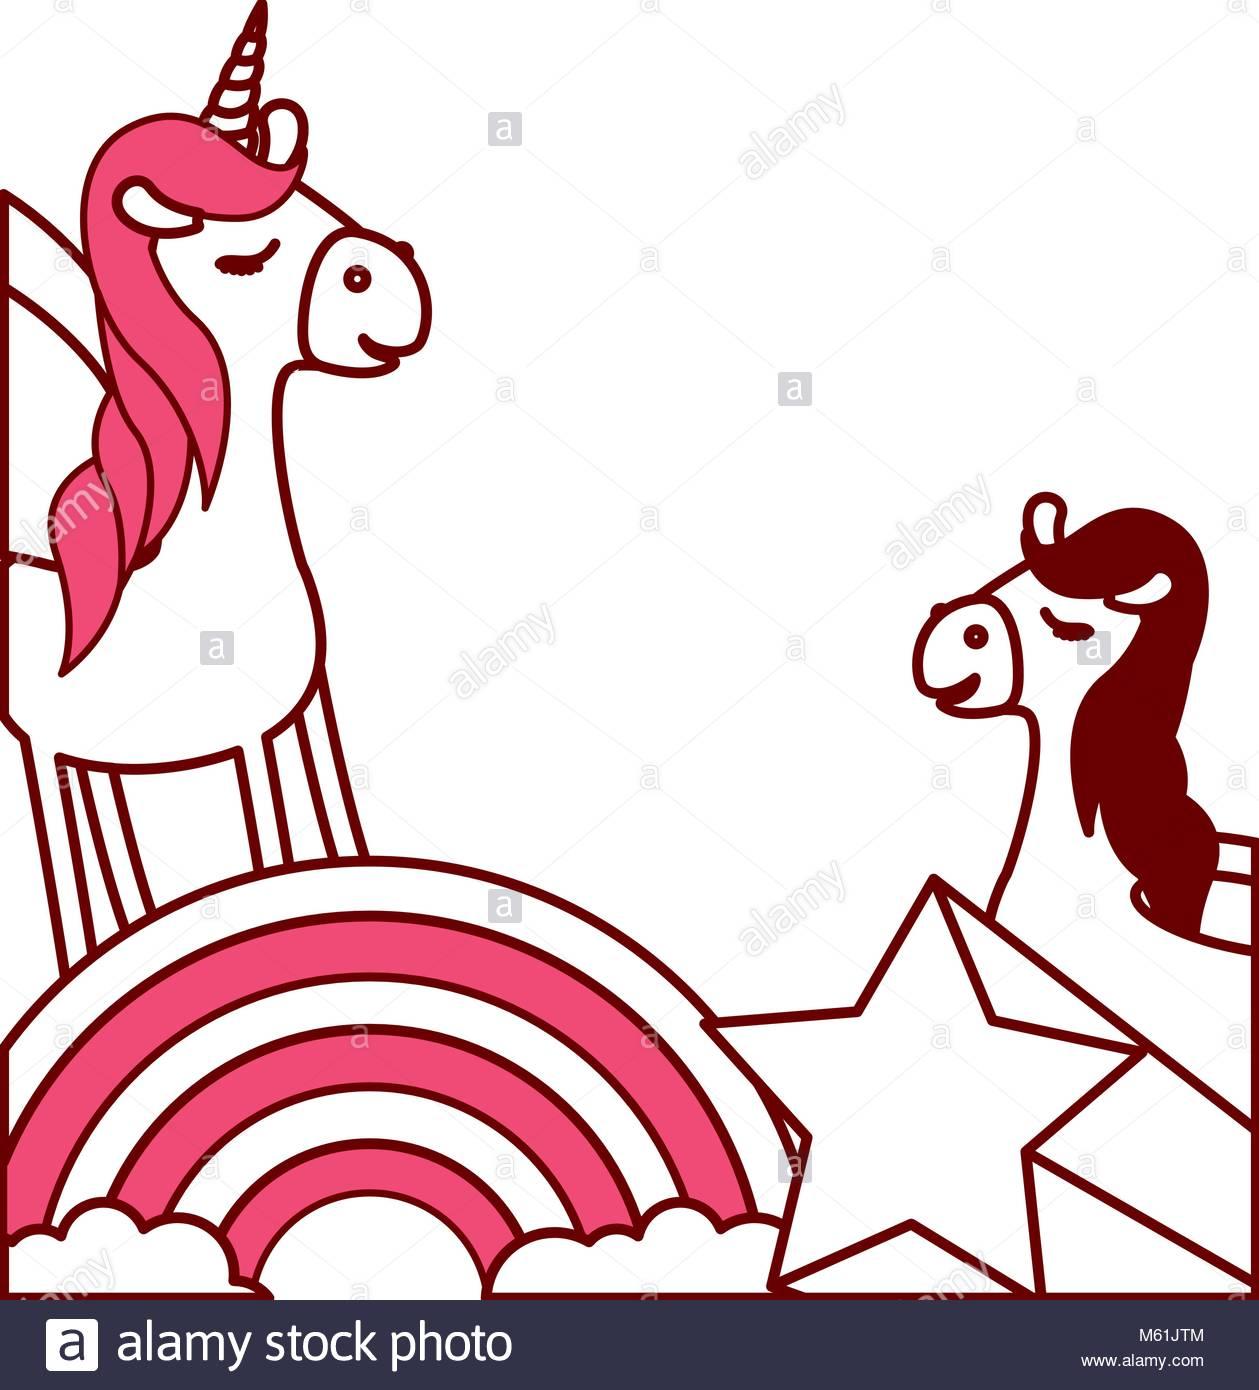 1259x1390 Unicorn Rainbow Stock Photos Amp Unicorn Rainbow Stock Images